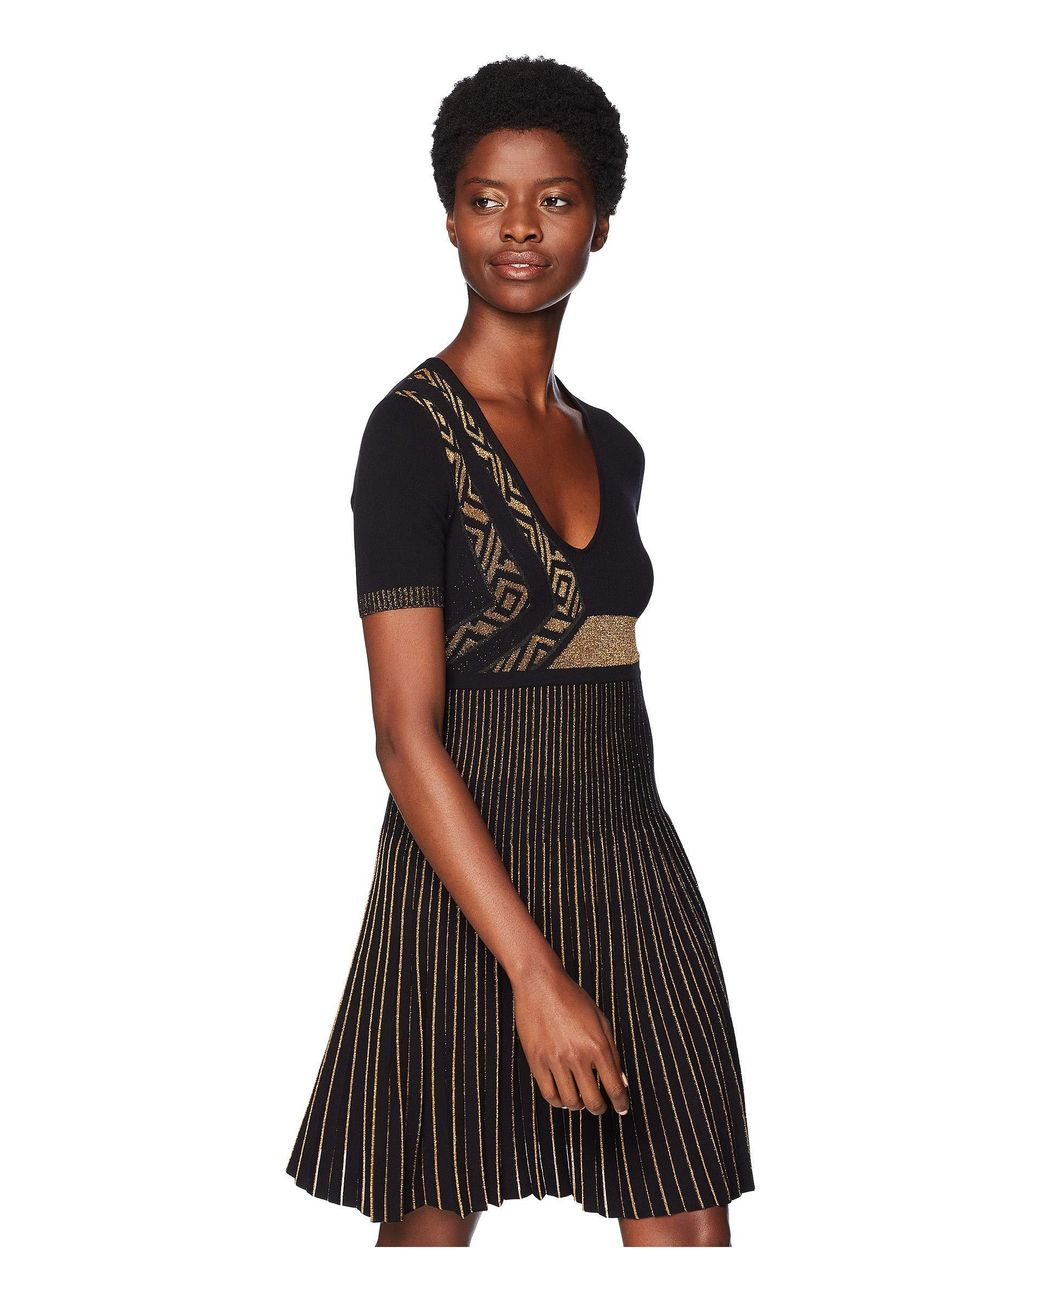 58d24594d511 Versace Abito Maglia Donna in Black - Save 64% - Lyst